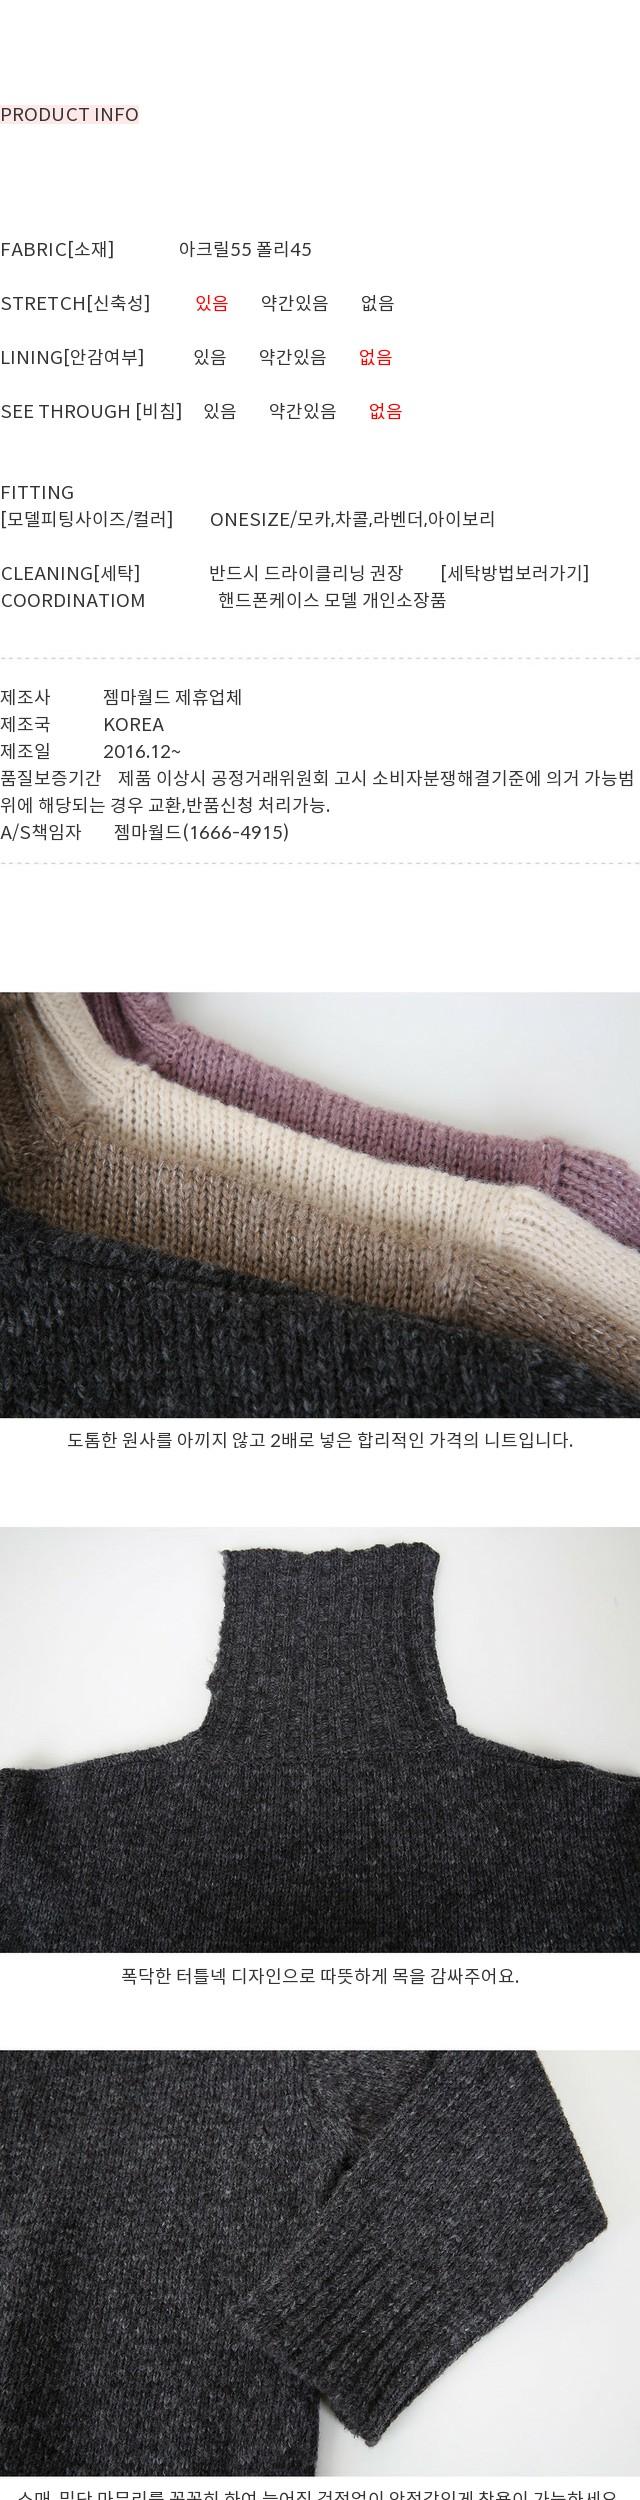 selfie - turtleneck knit